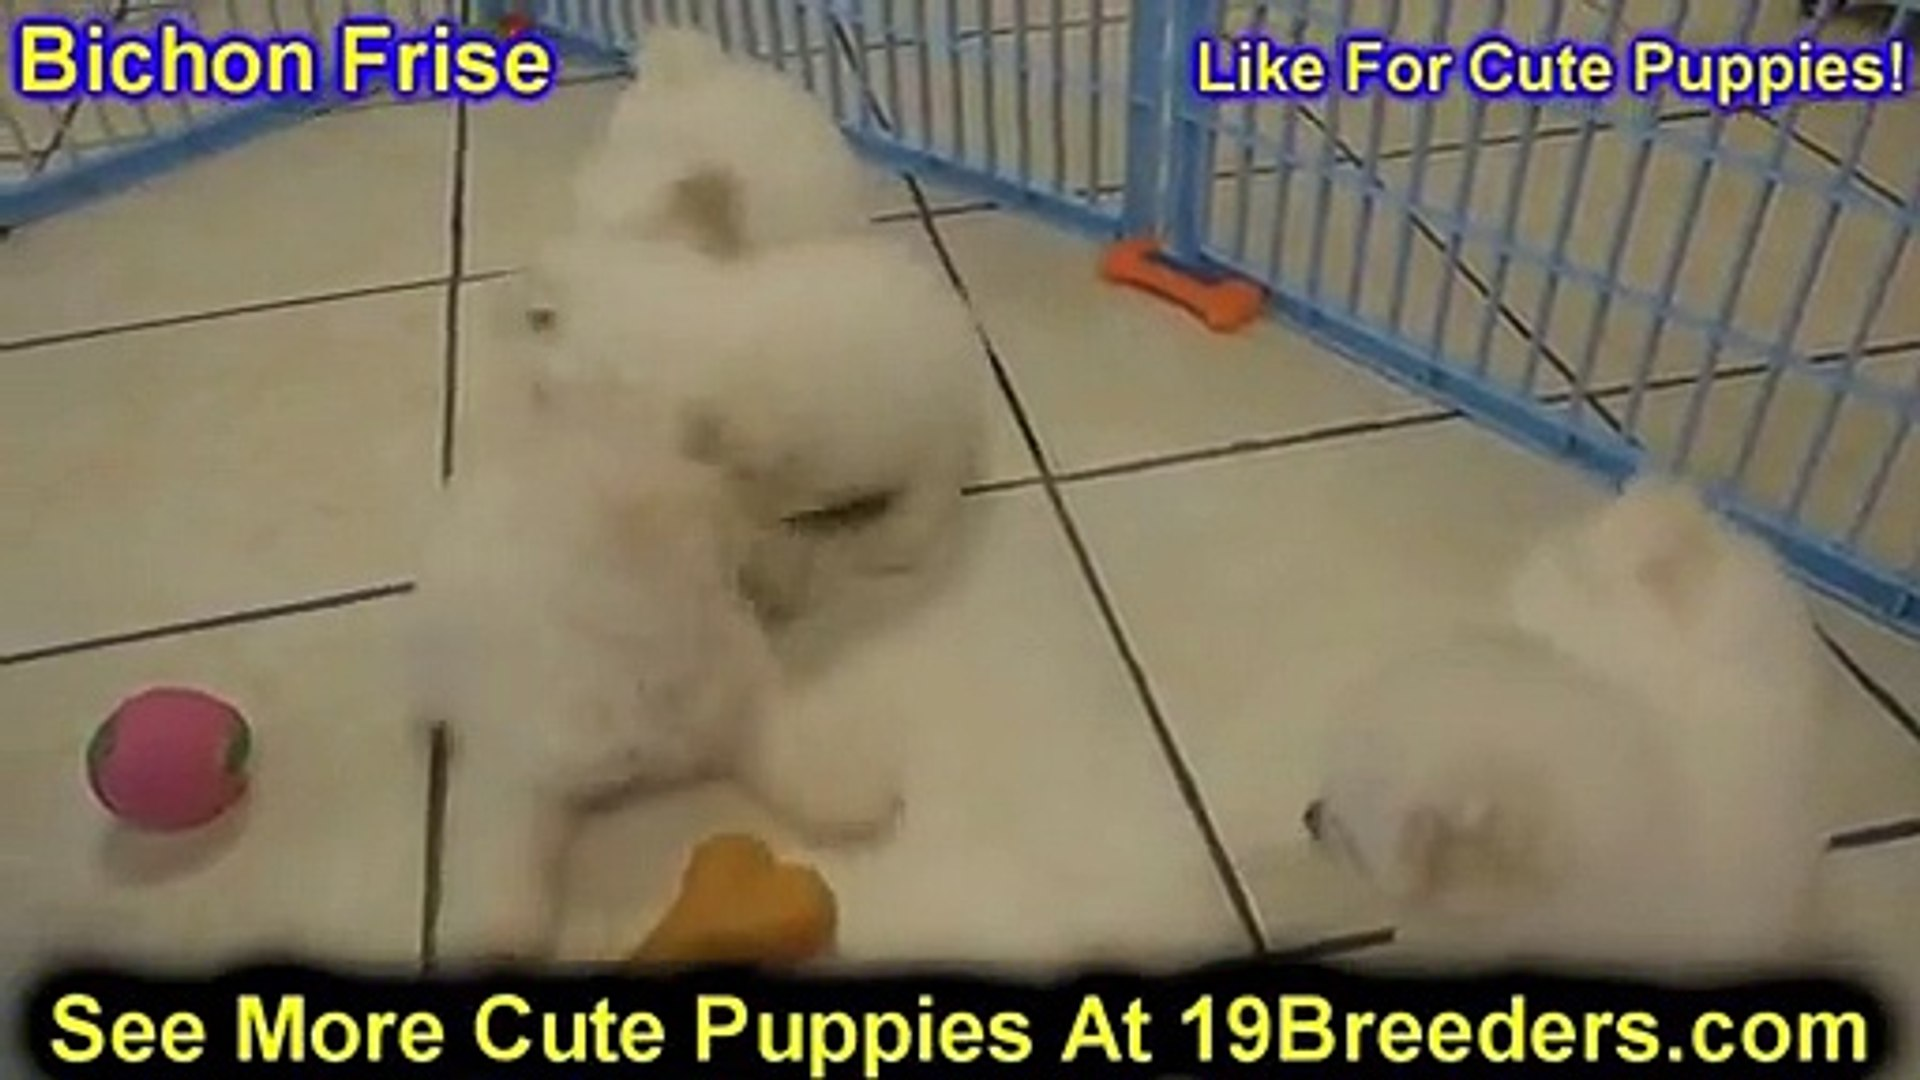 Bichon Frise, Puppies, For, Sale, In, San Jose, California, CA, Ontario,  Santa Rosa, Rancho Cucamong